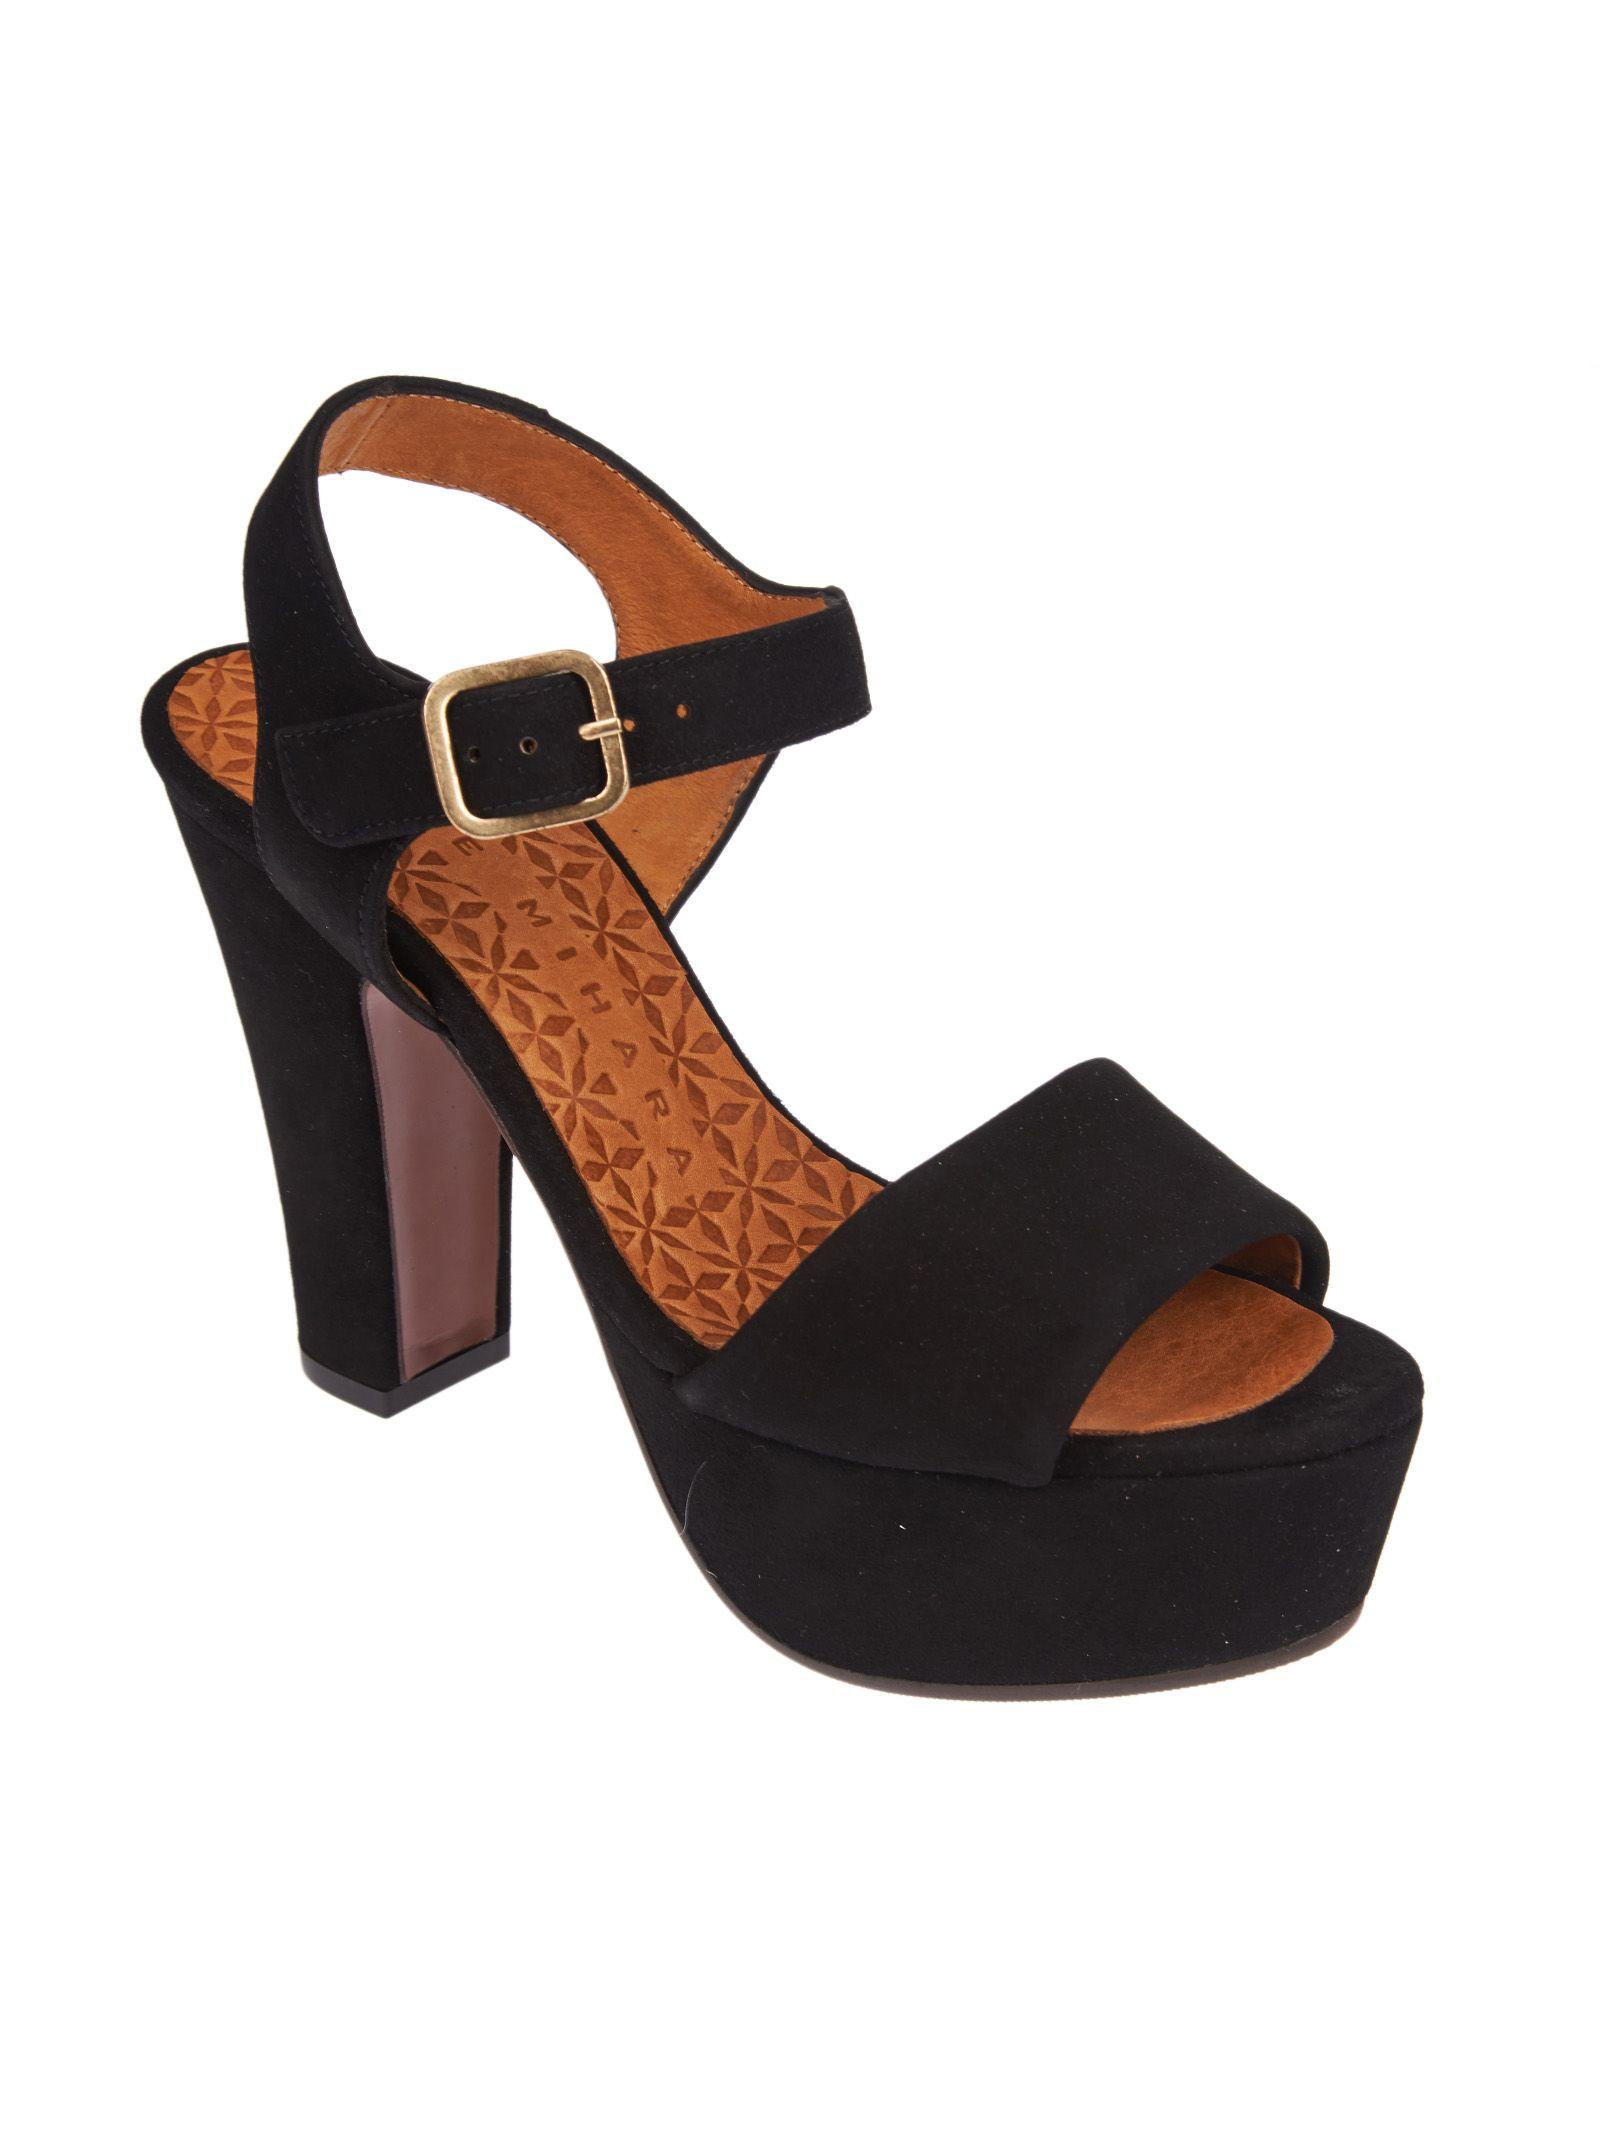 ad8ce00f6cd Chie Mihara Chie Mihara Xarco Platform Sandals - Black - 10532956 ...